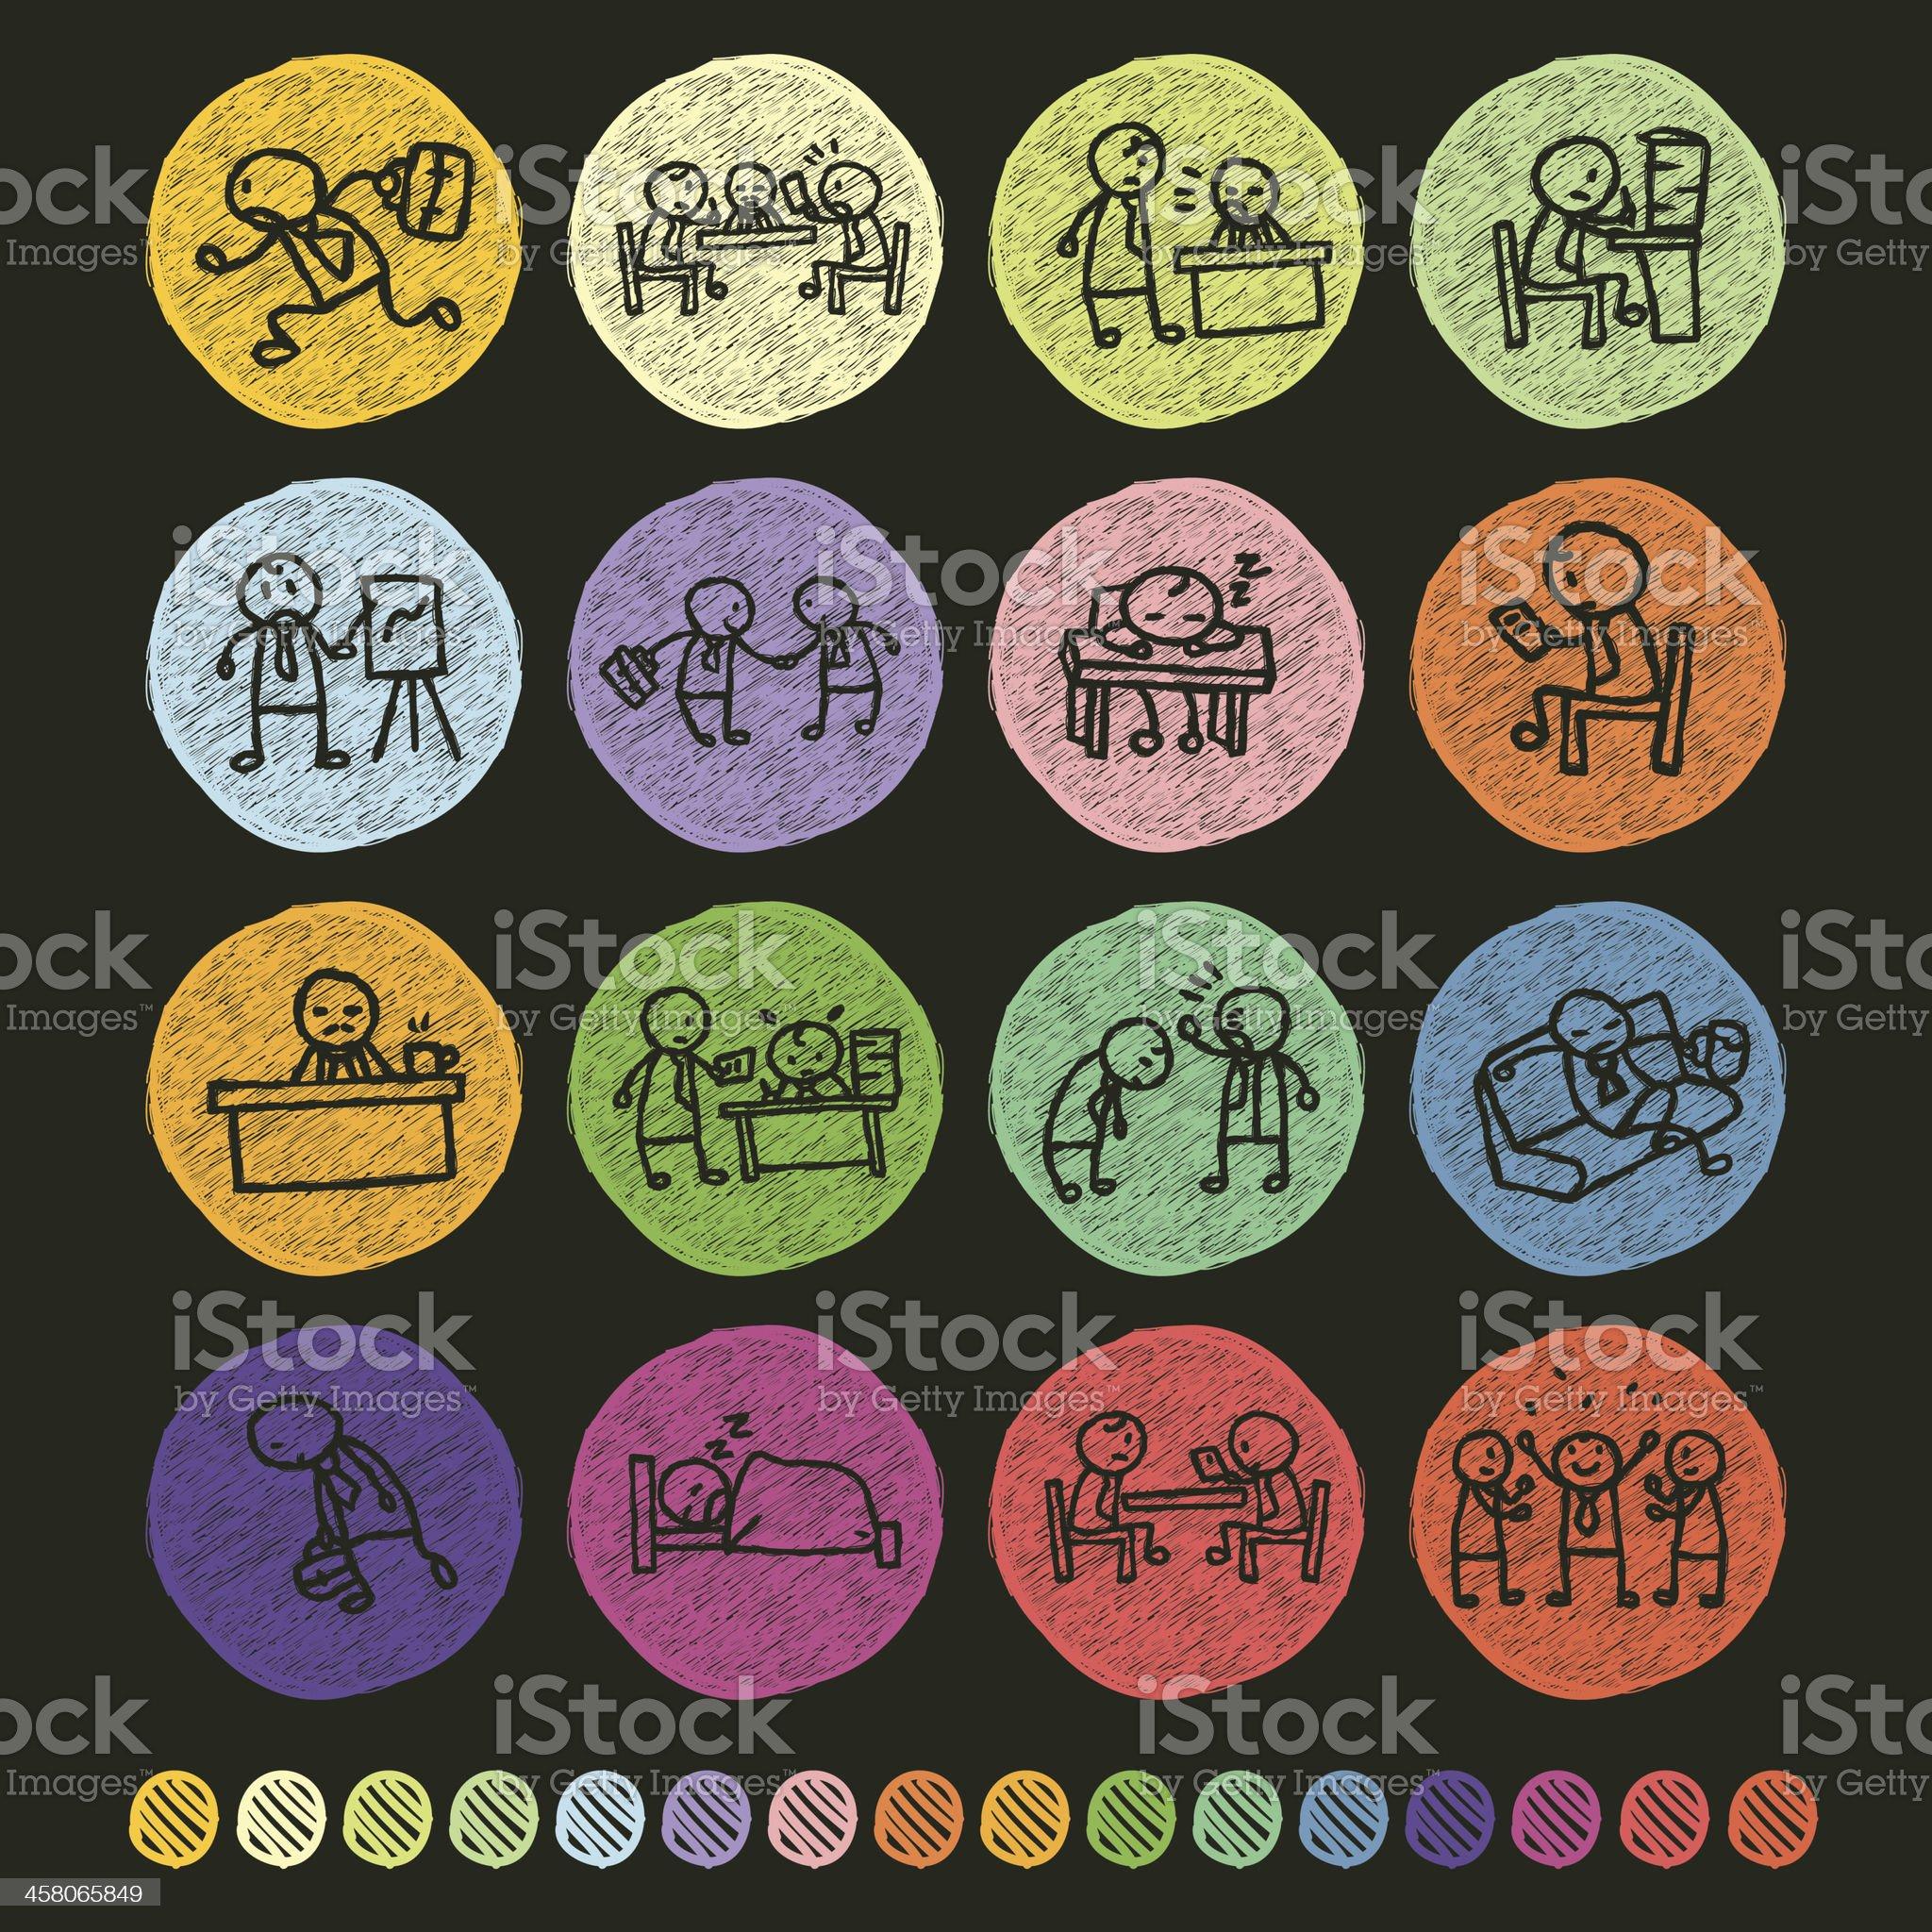 Set of Salaryman icons royalty-free stock vector art